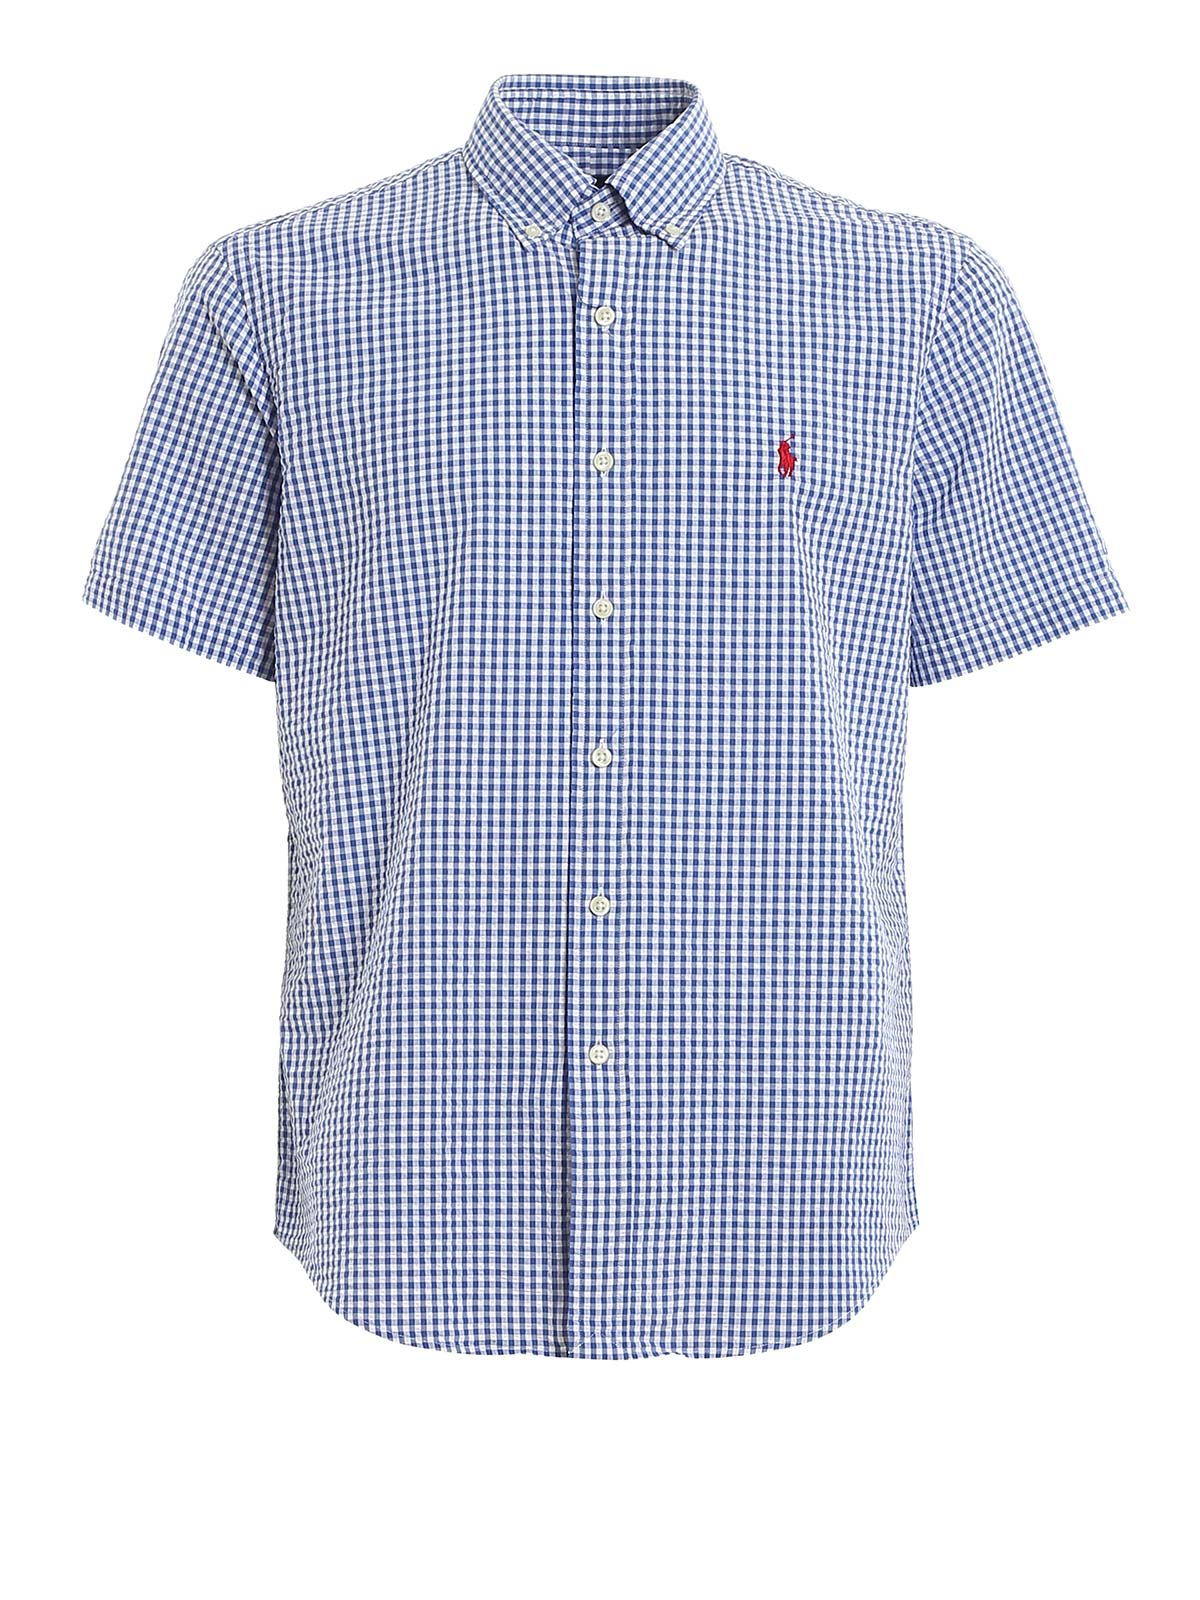 Picture of POLO RALPH LAUREN | Men's Check Short Sleeve Shirt